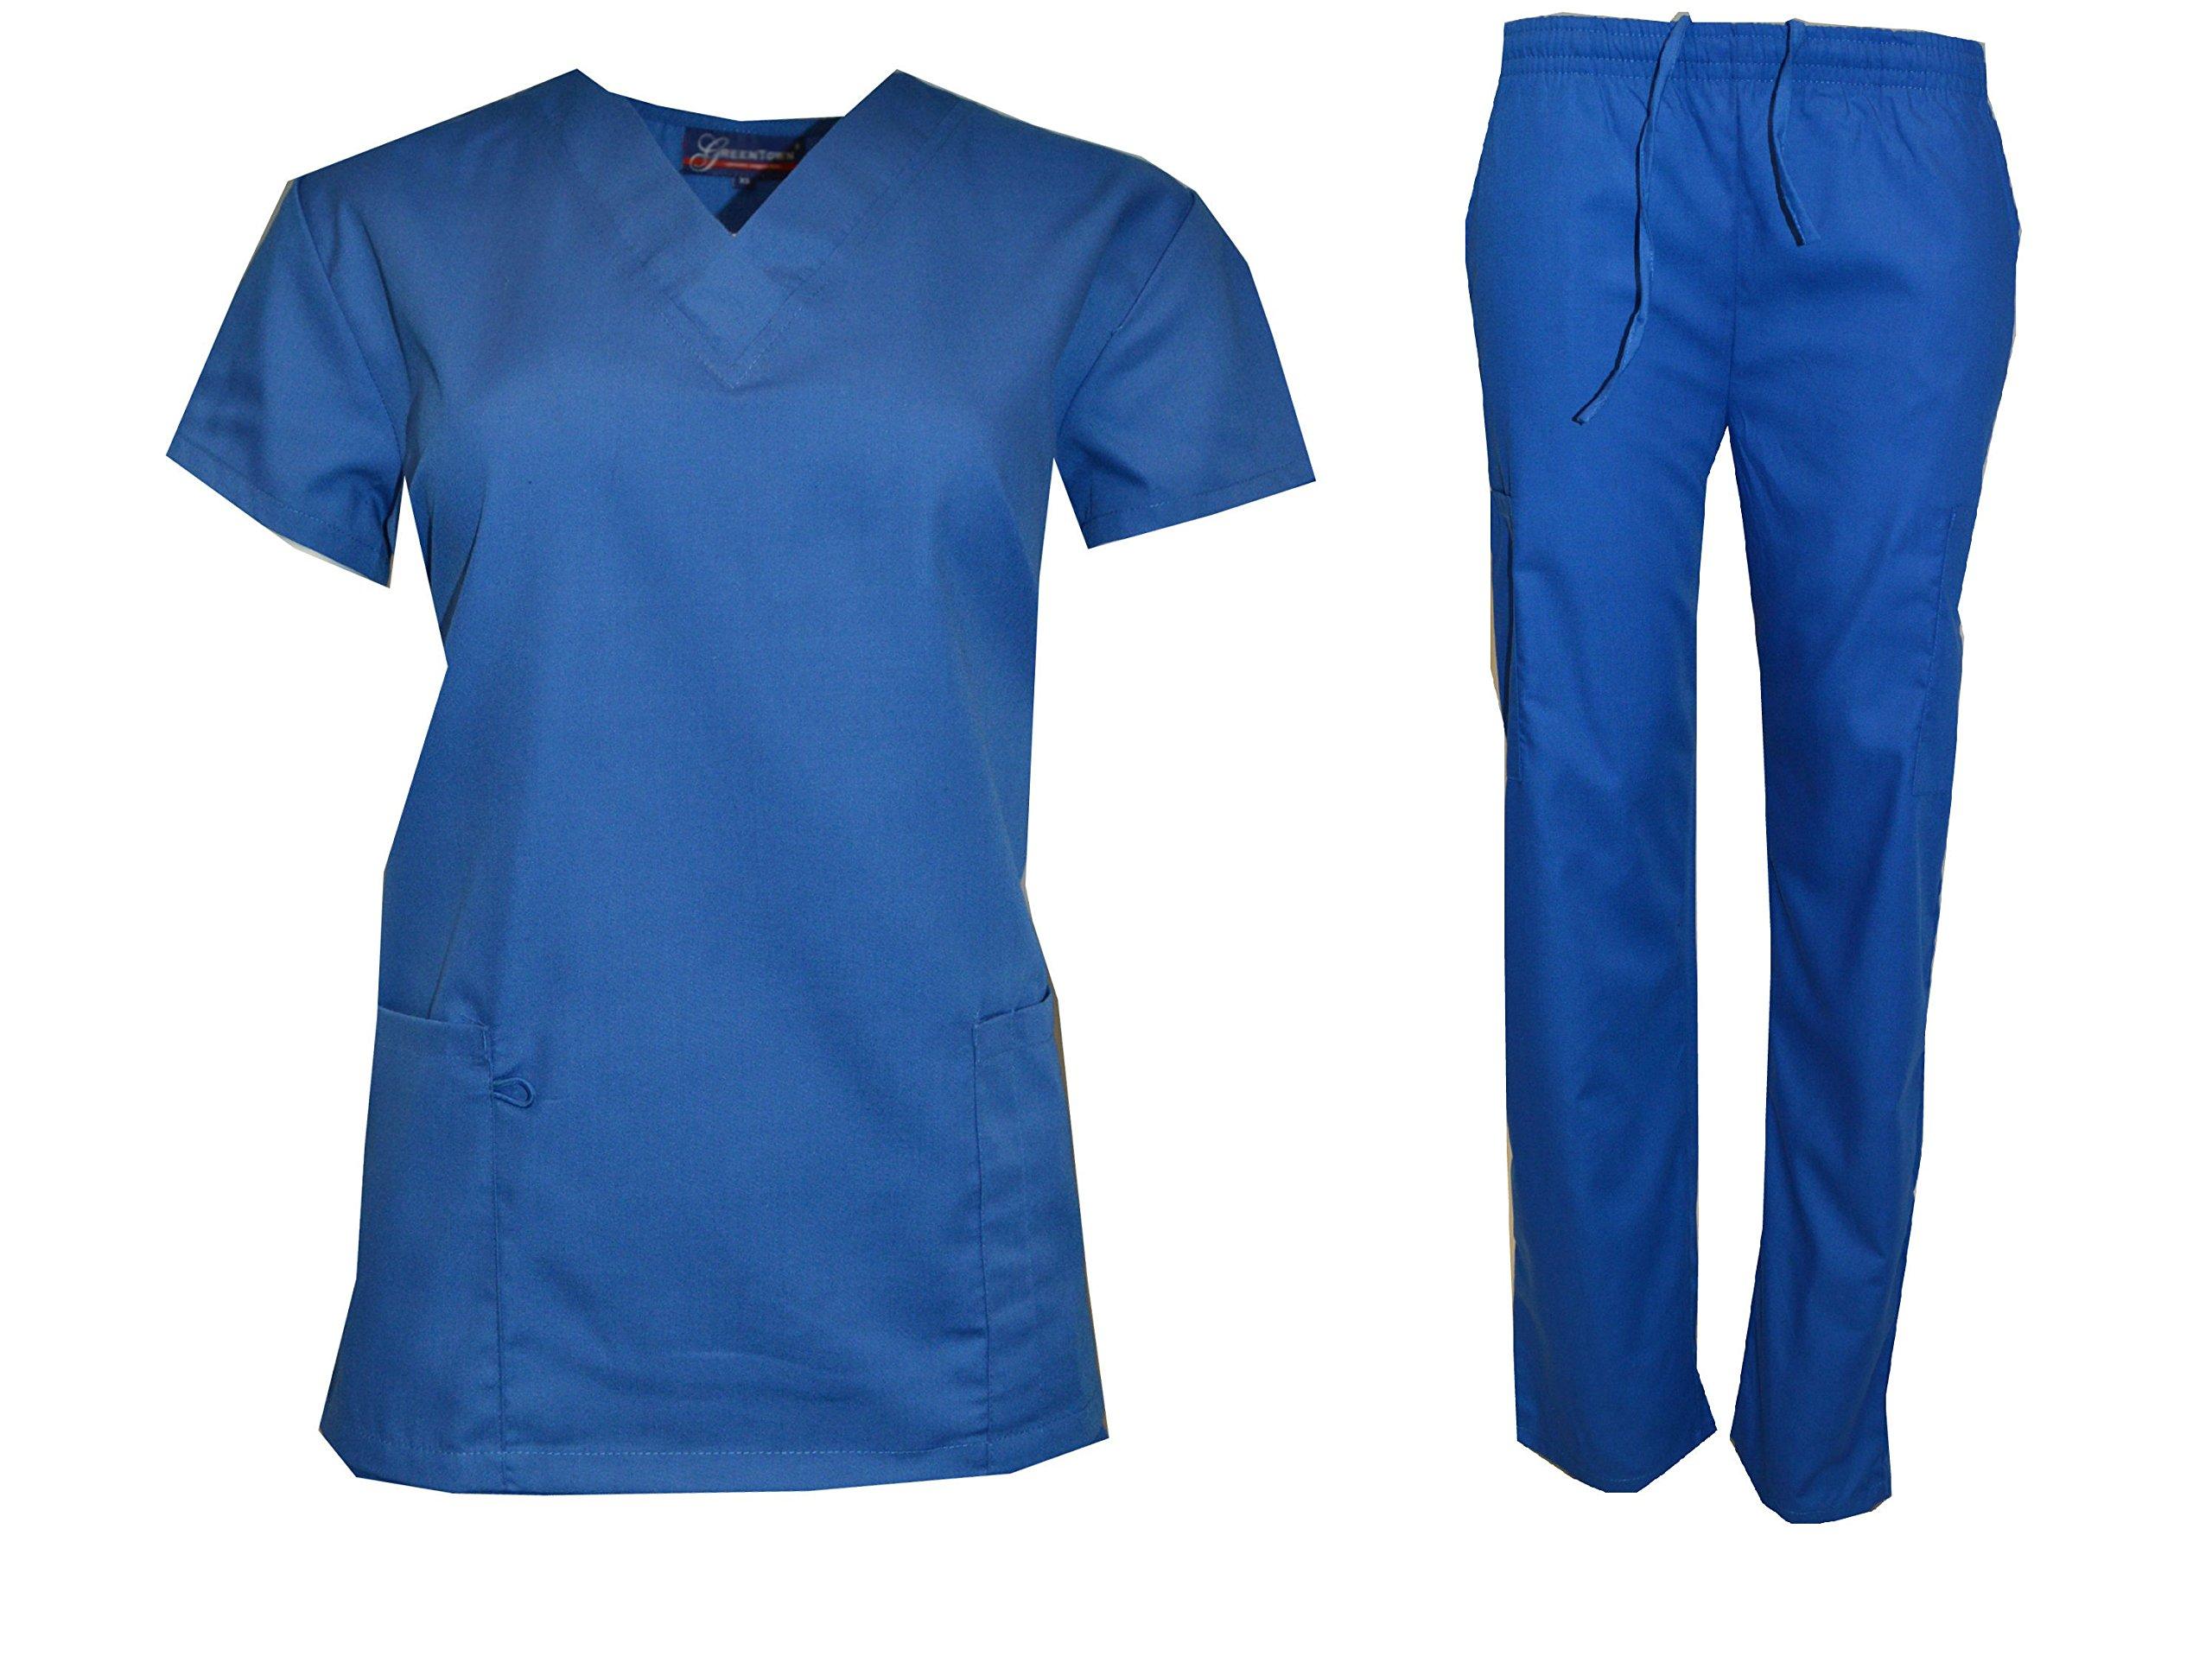 Scrub Lot Wholesale Medical Sets Top Pant Solid Bulk Qty 12 Medical Nursing Hospital (M (12 Sets), Royal)